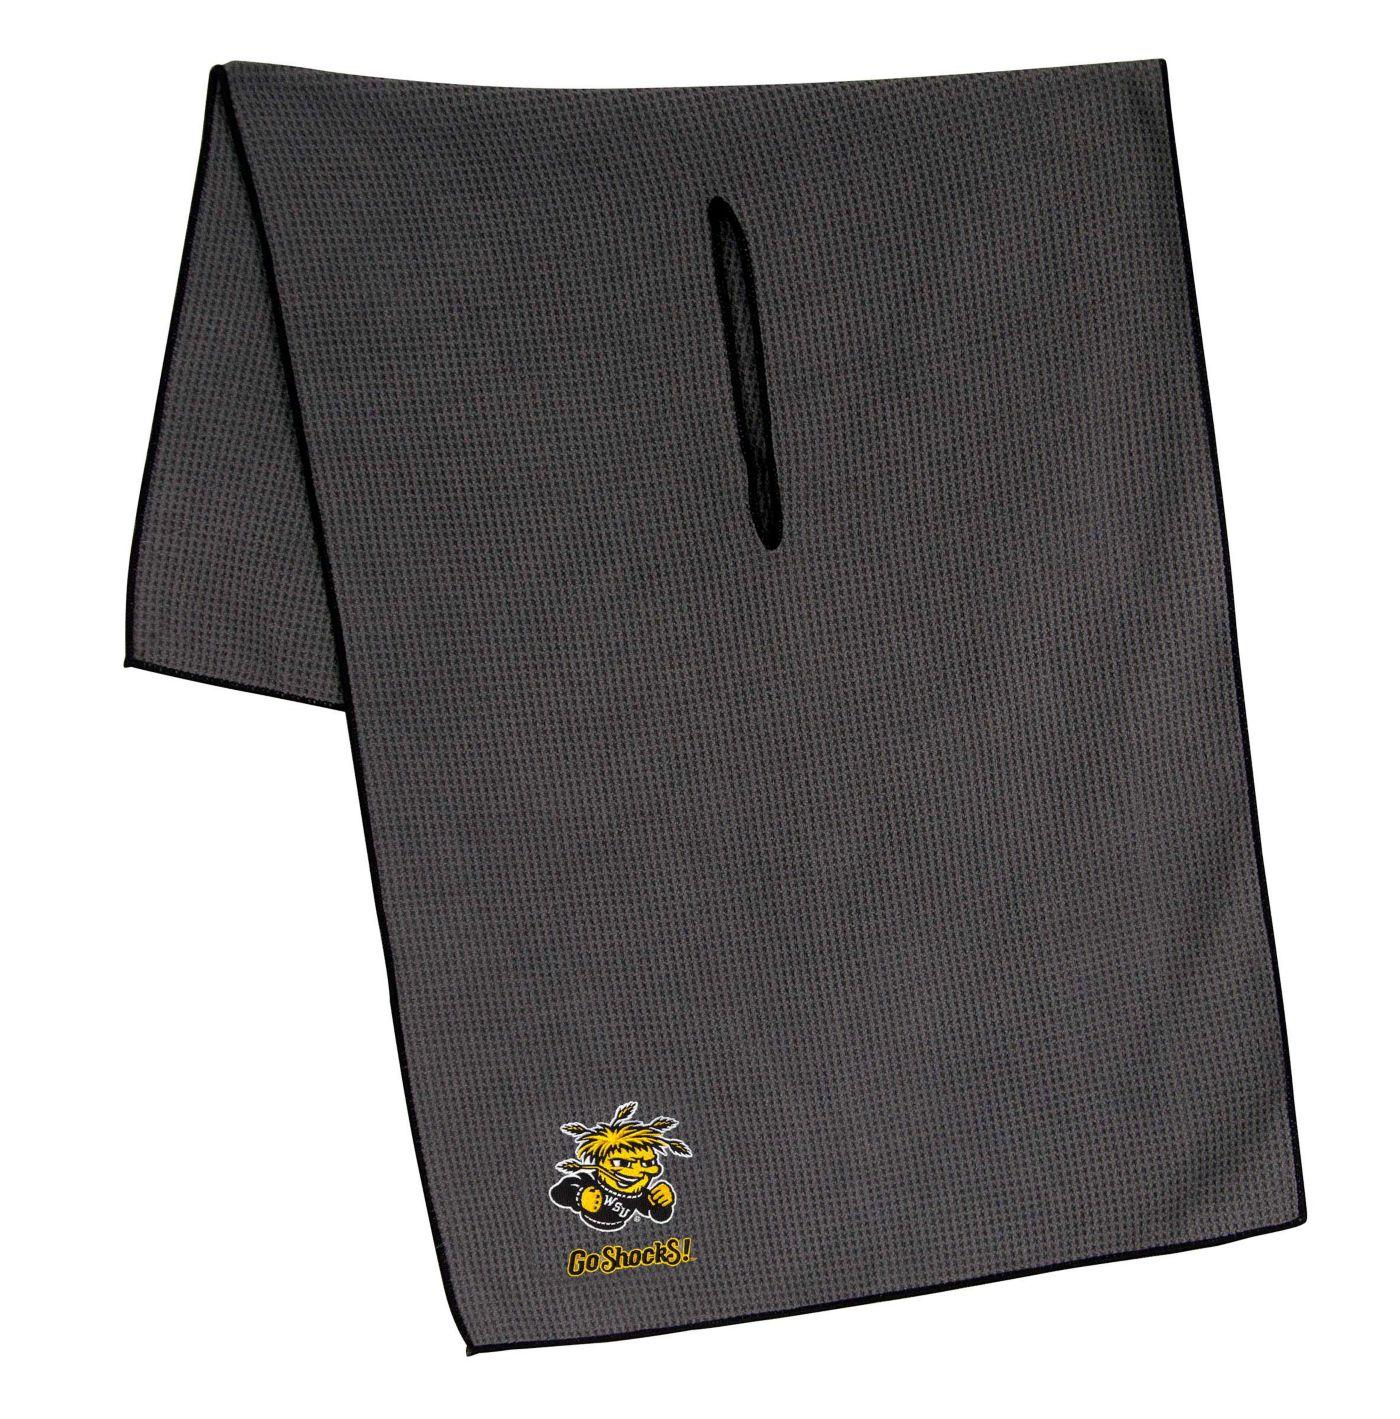 "Team Effort Wichita State Shockers 19"" x 41"" Microfiber Golf Towel"